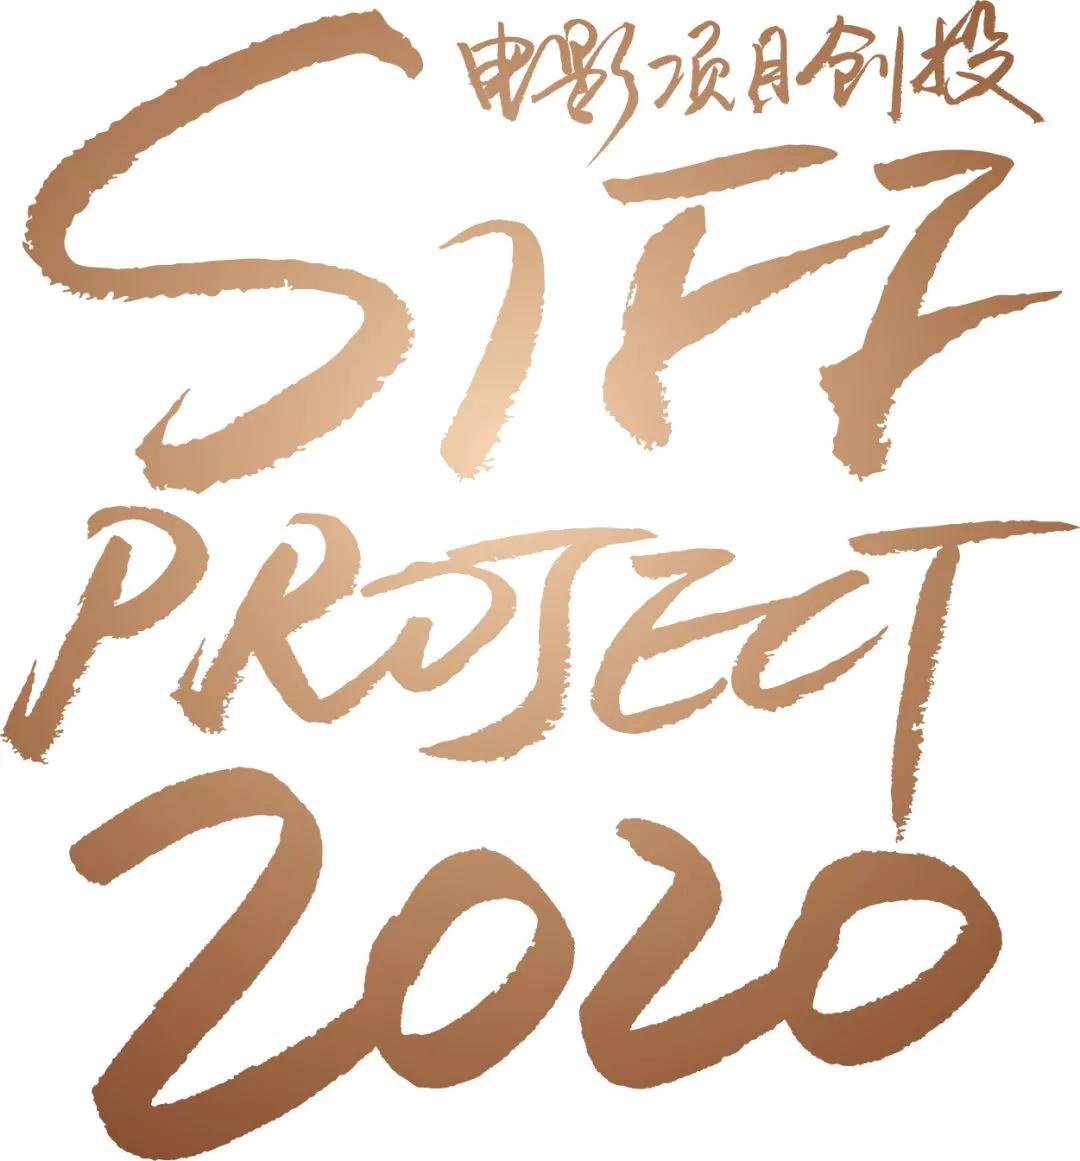 allbet:上影节创投项目评委会名单宣布 刁亦男任主席